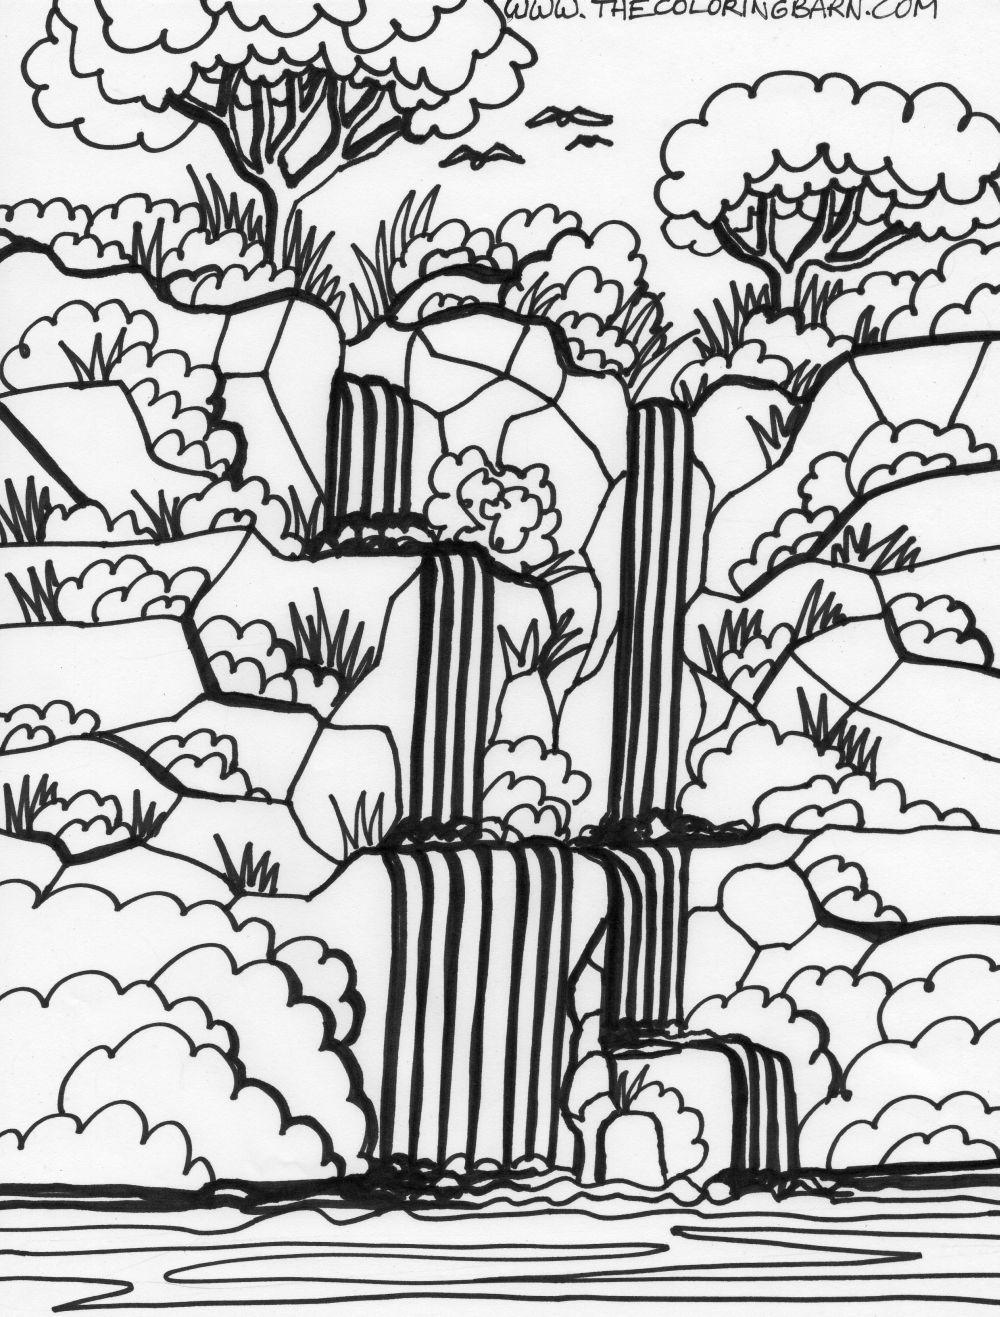 Rainforest Coloring Pages Jungle Coloring Pages Printable Christmas Coloring Pages Christmas Coloring Pages